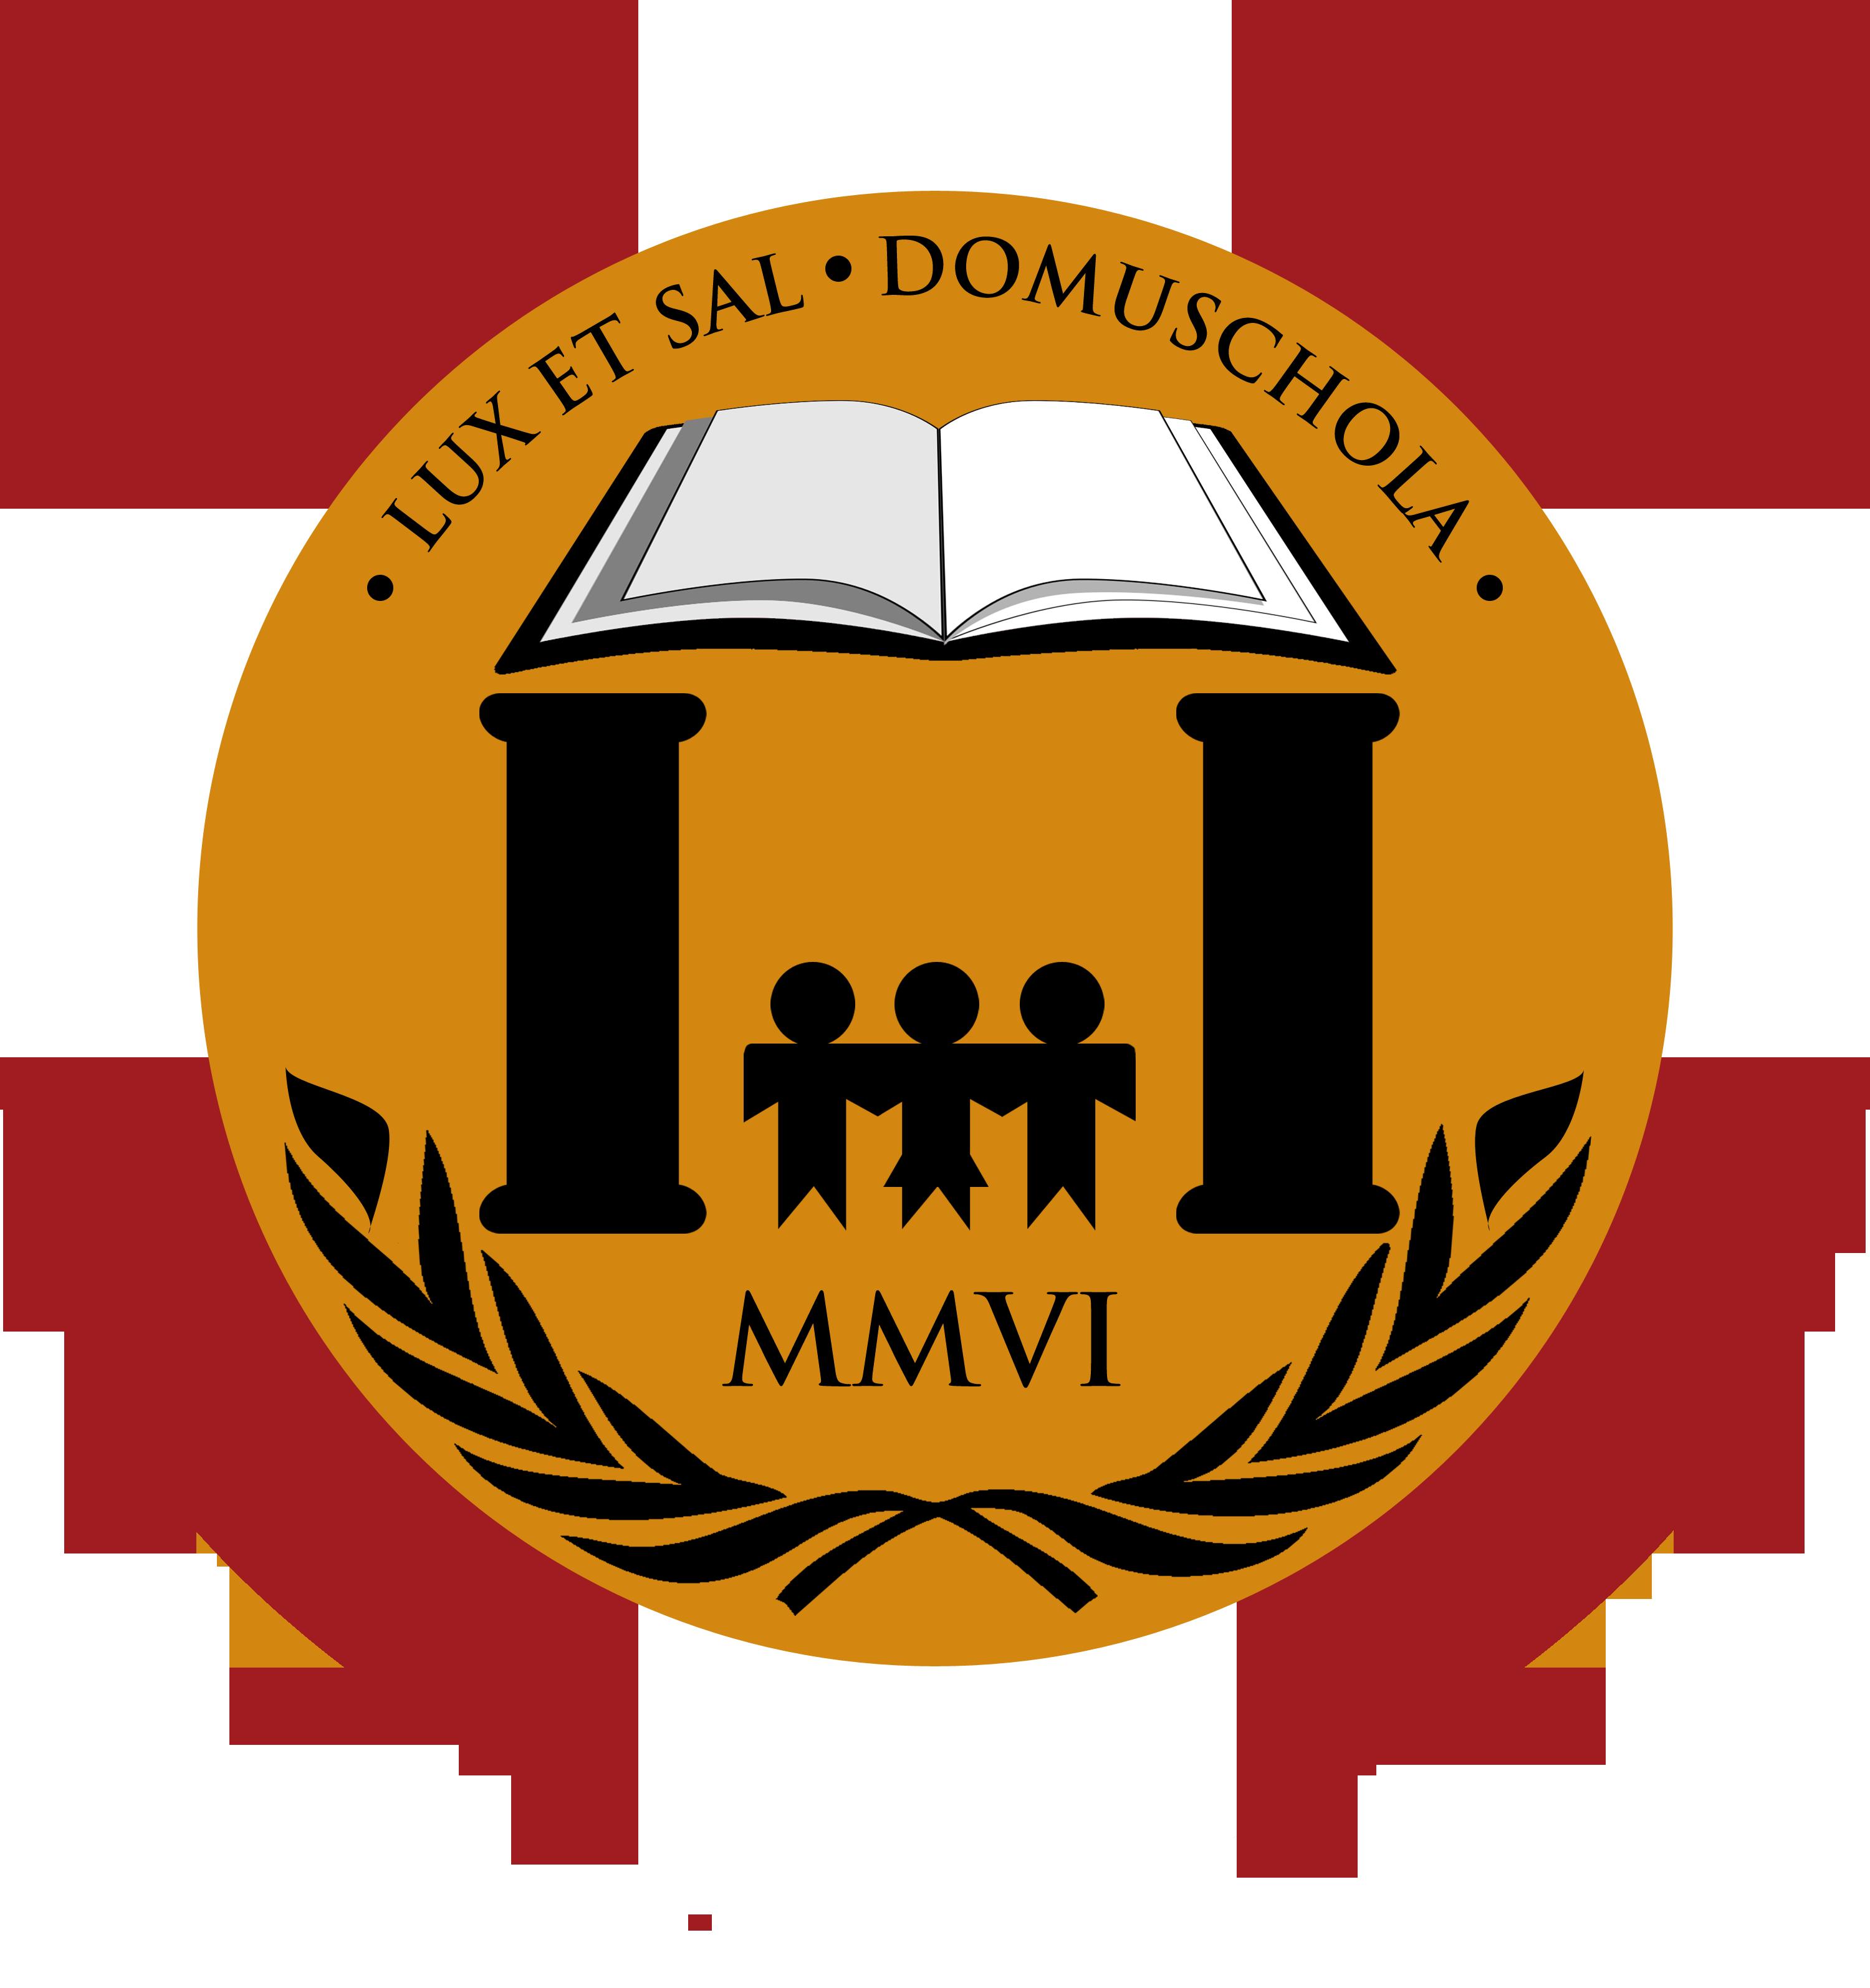 Domuschola International School Logo